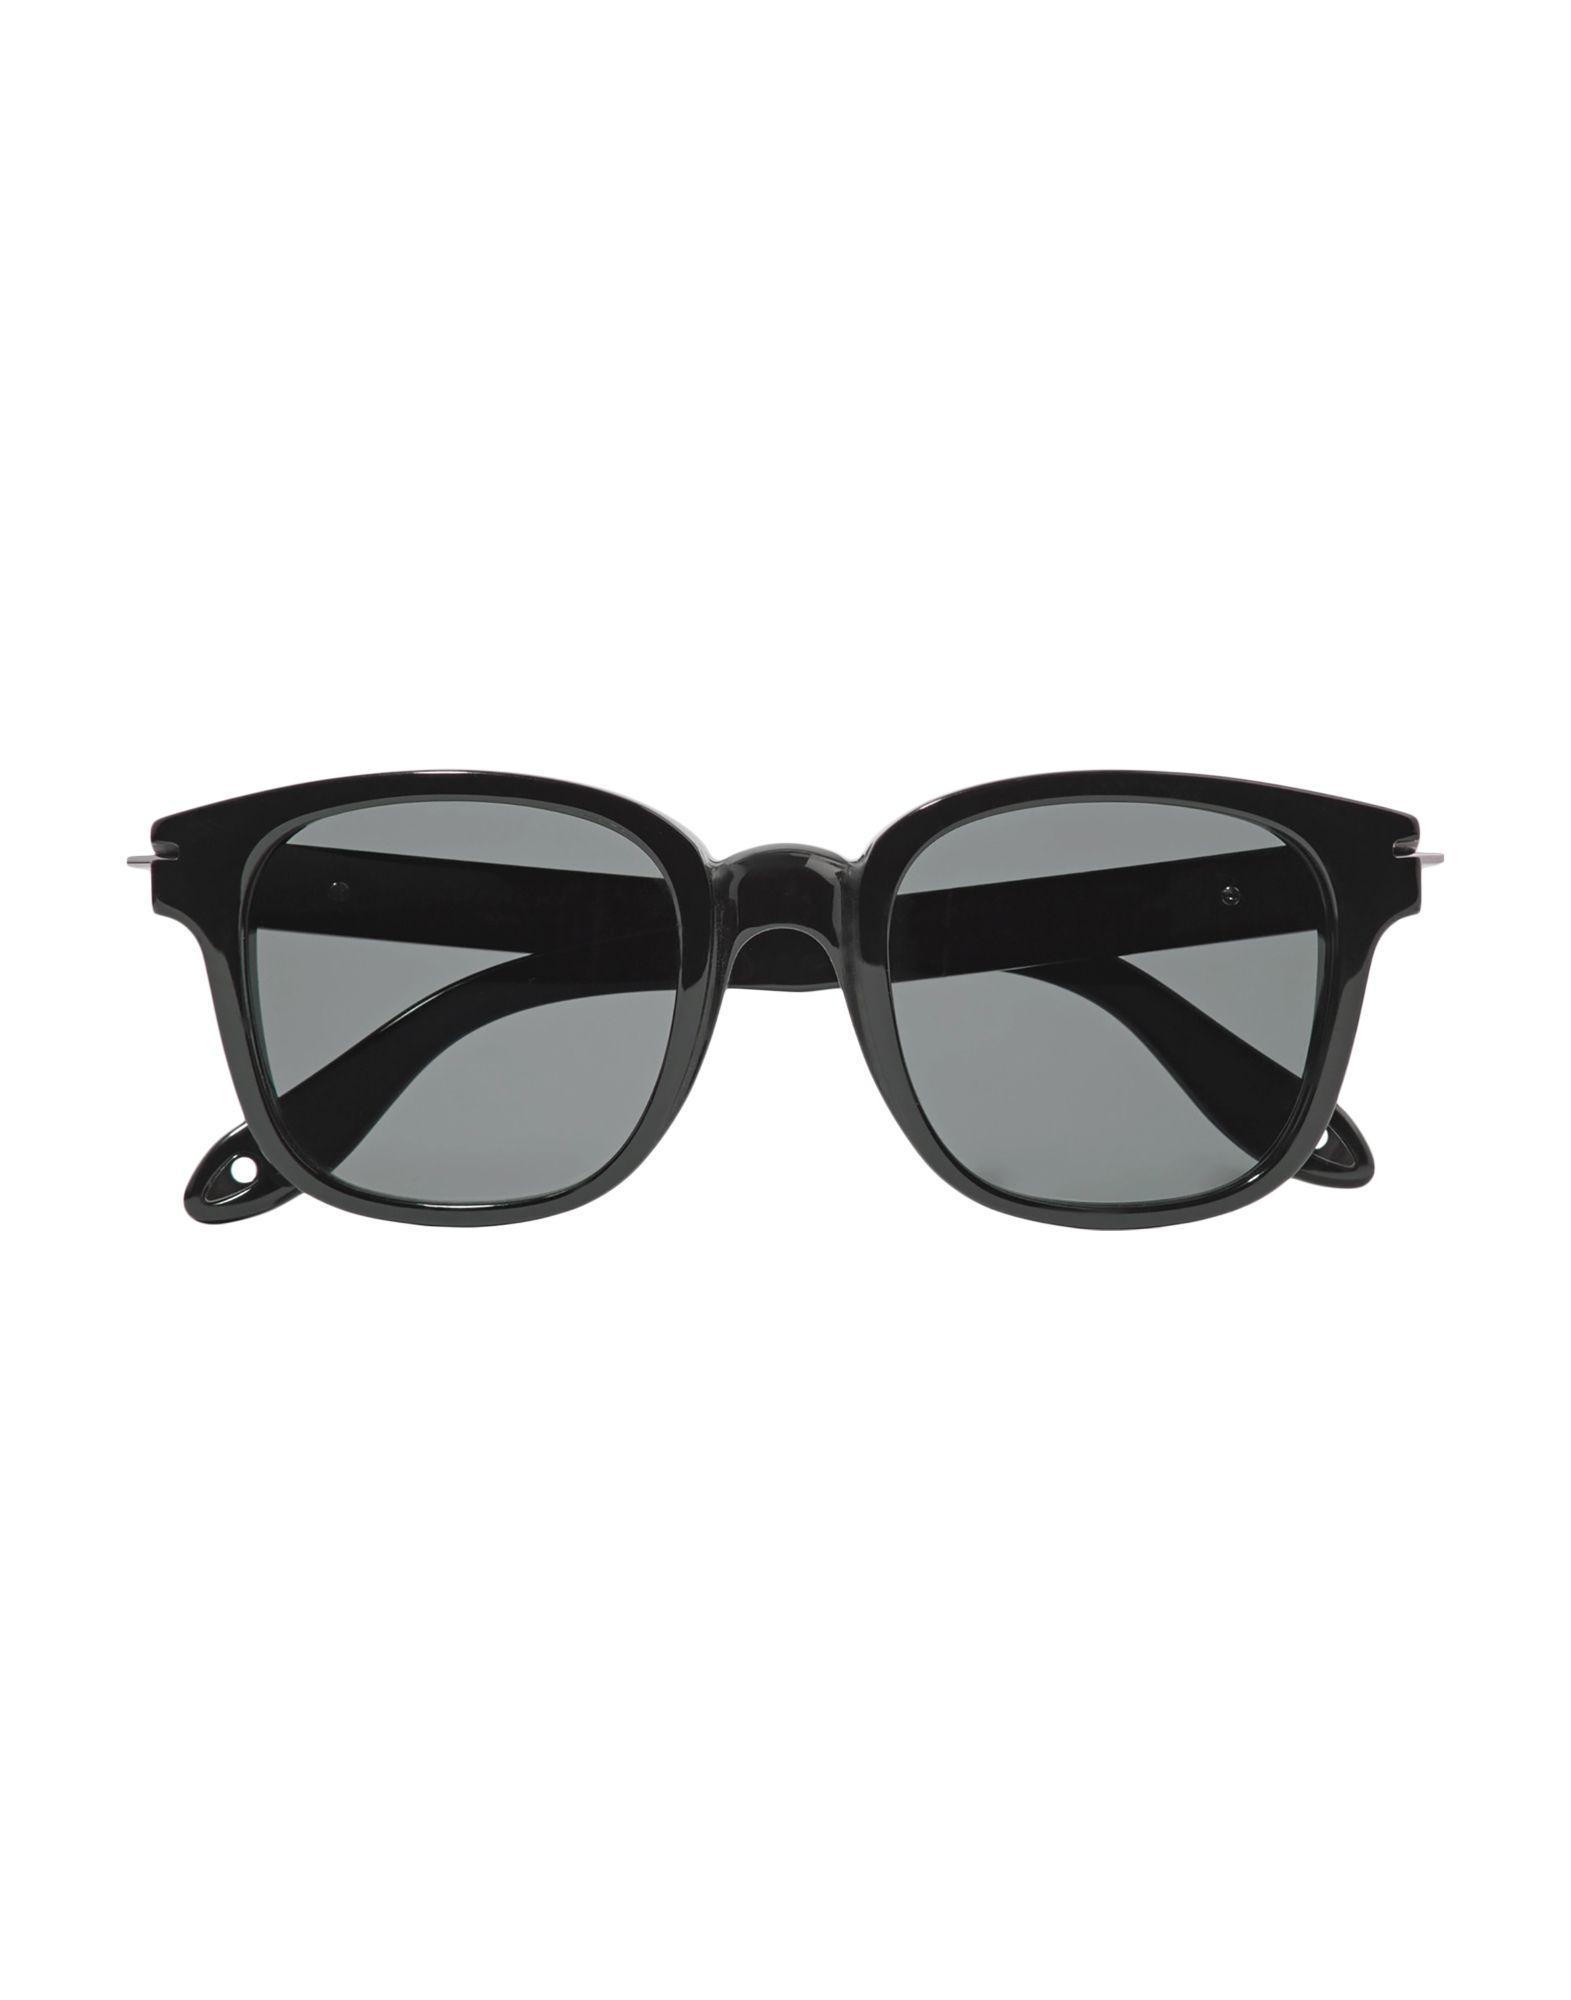 design di qualità 9c9ae 329ac Occhiali Da Sole Givenchy Donna - Acquista online su YOOX ...